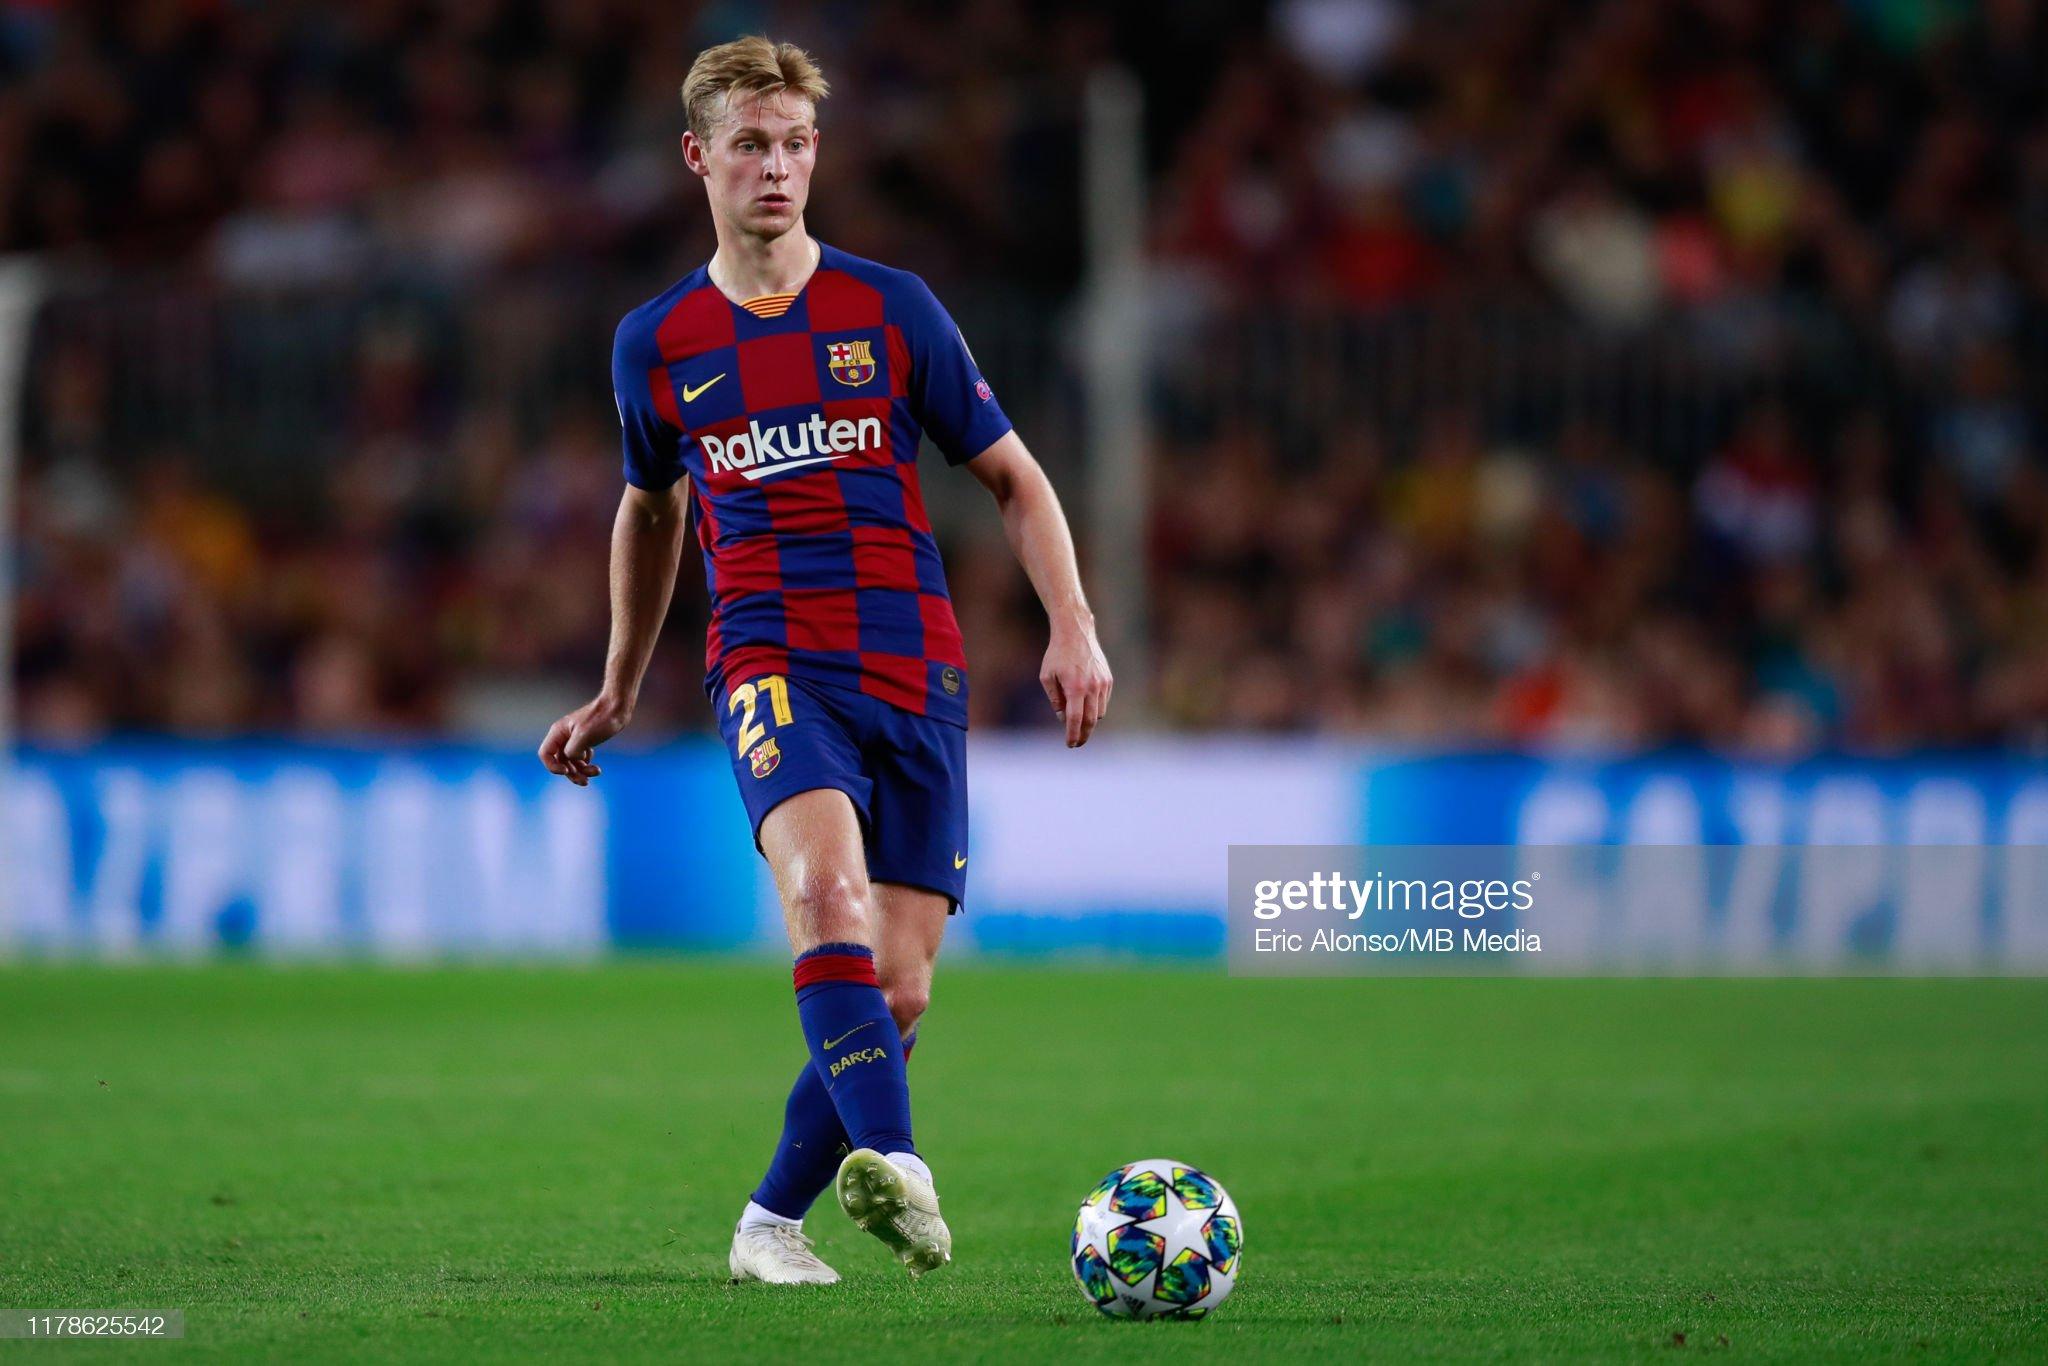 صور مباراة : برشلونة - إنتر 2-1 ( 02-10-2019 )  Frenkie-de-jong-of-fc-barcelona-passes-the-ball-during-the-uefa-f-picture-id1178625542?s=2048x2048